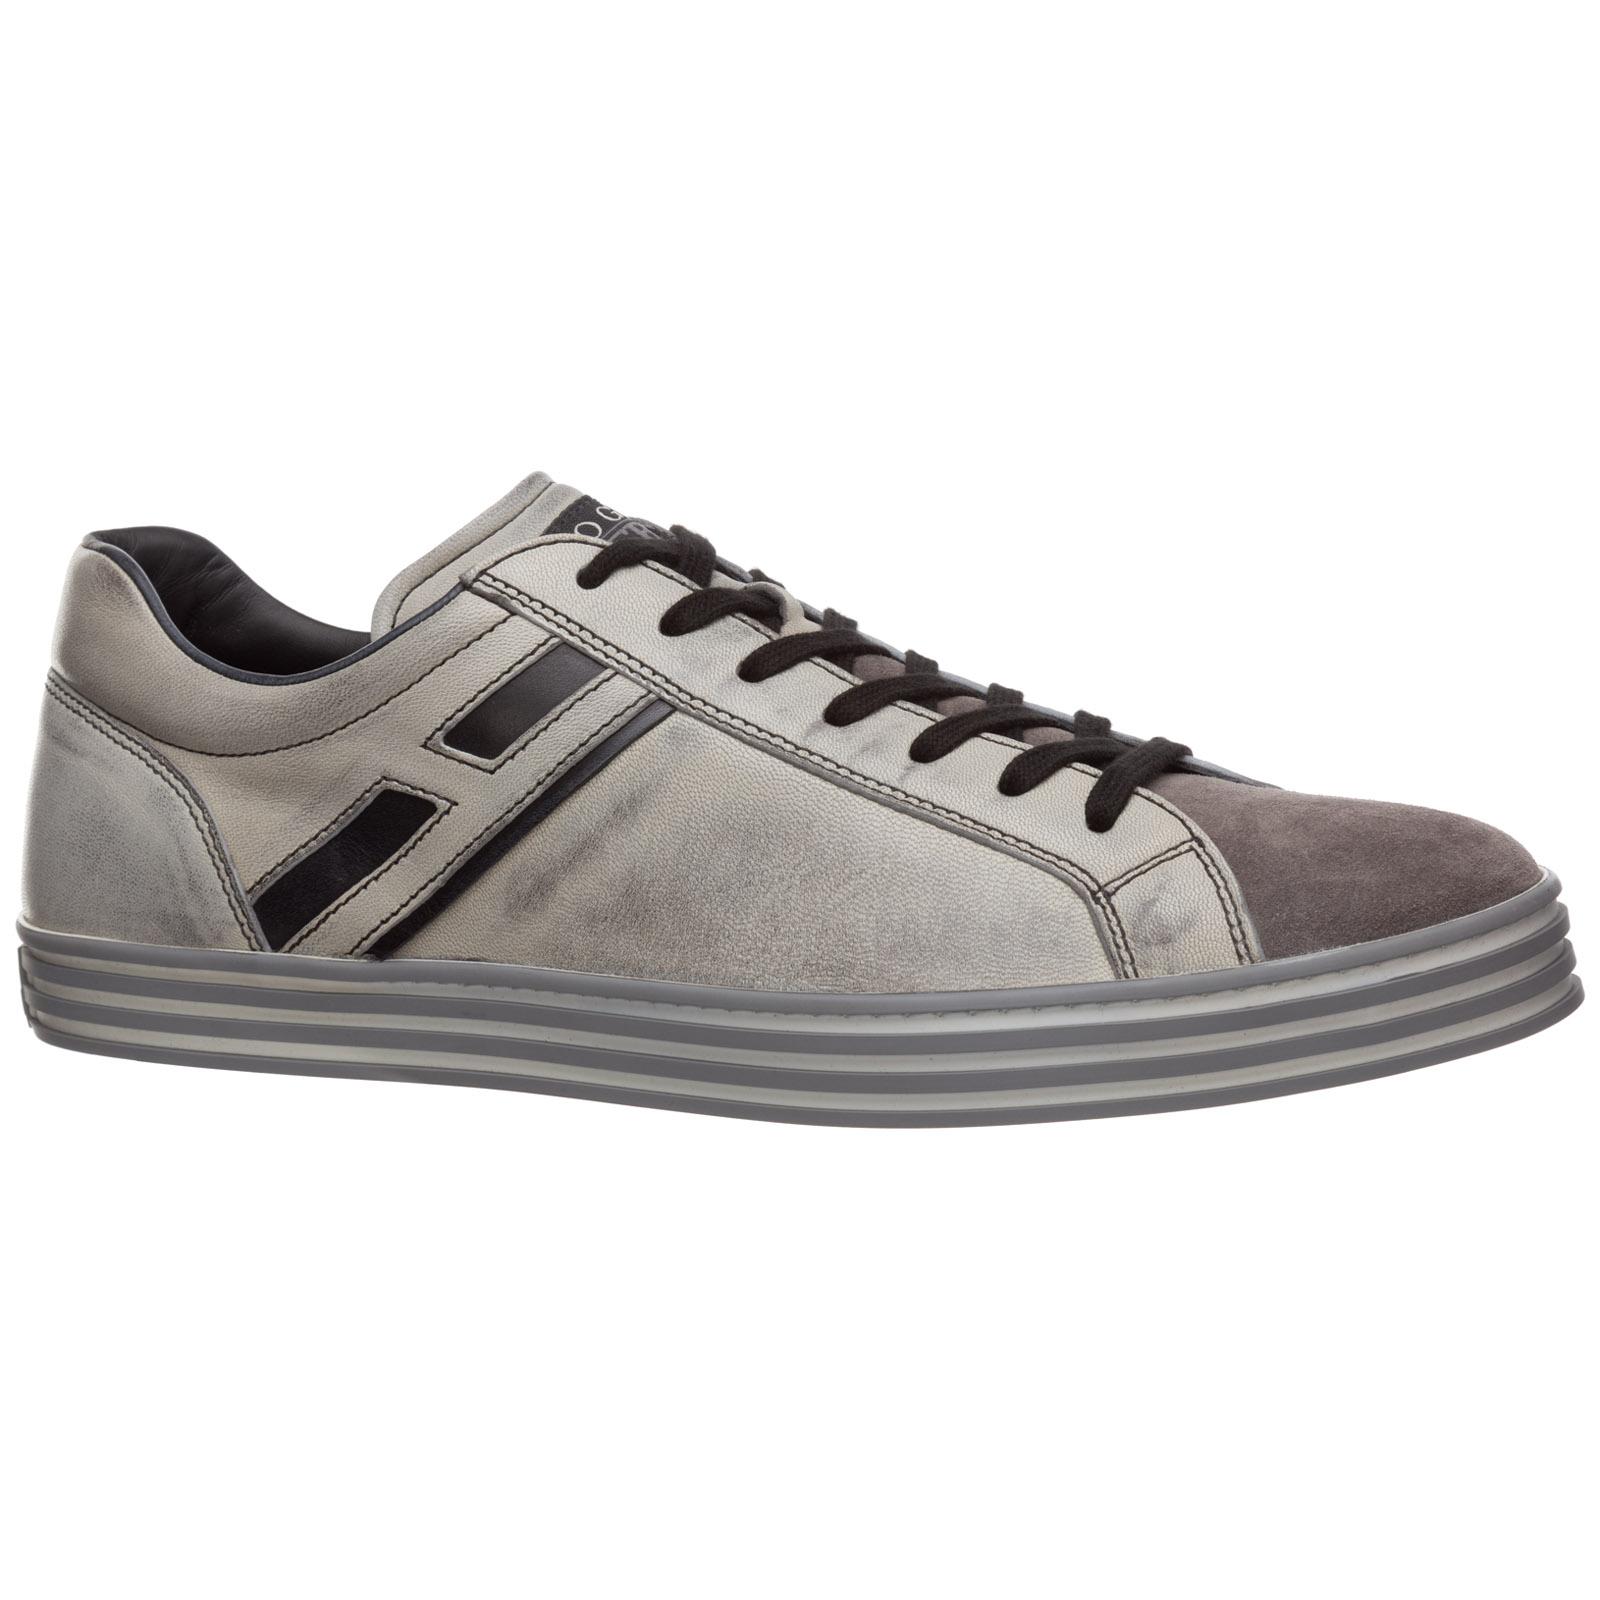 Sneakers Hogan Rebel R141 HXM1410O20075W0803 nero piombo  9a9abb4369b